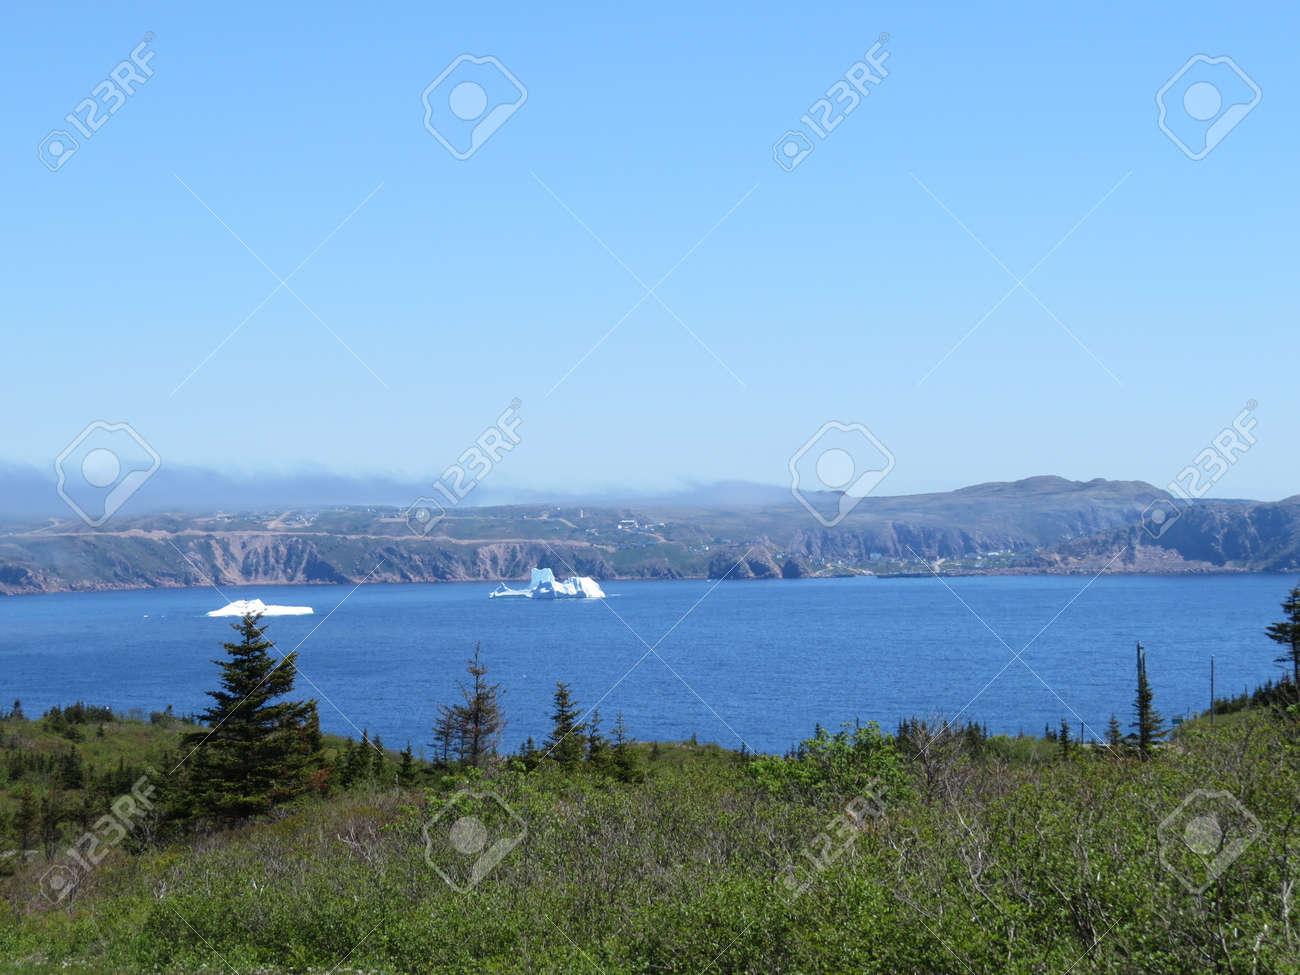 iceberg off the coast Stock Photo - 30153248